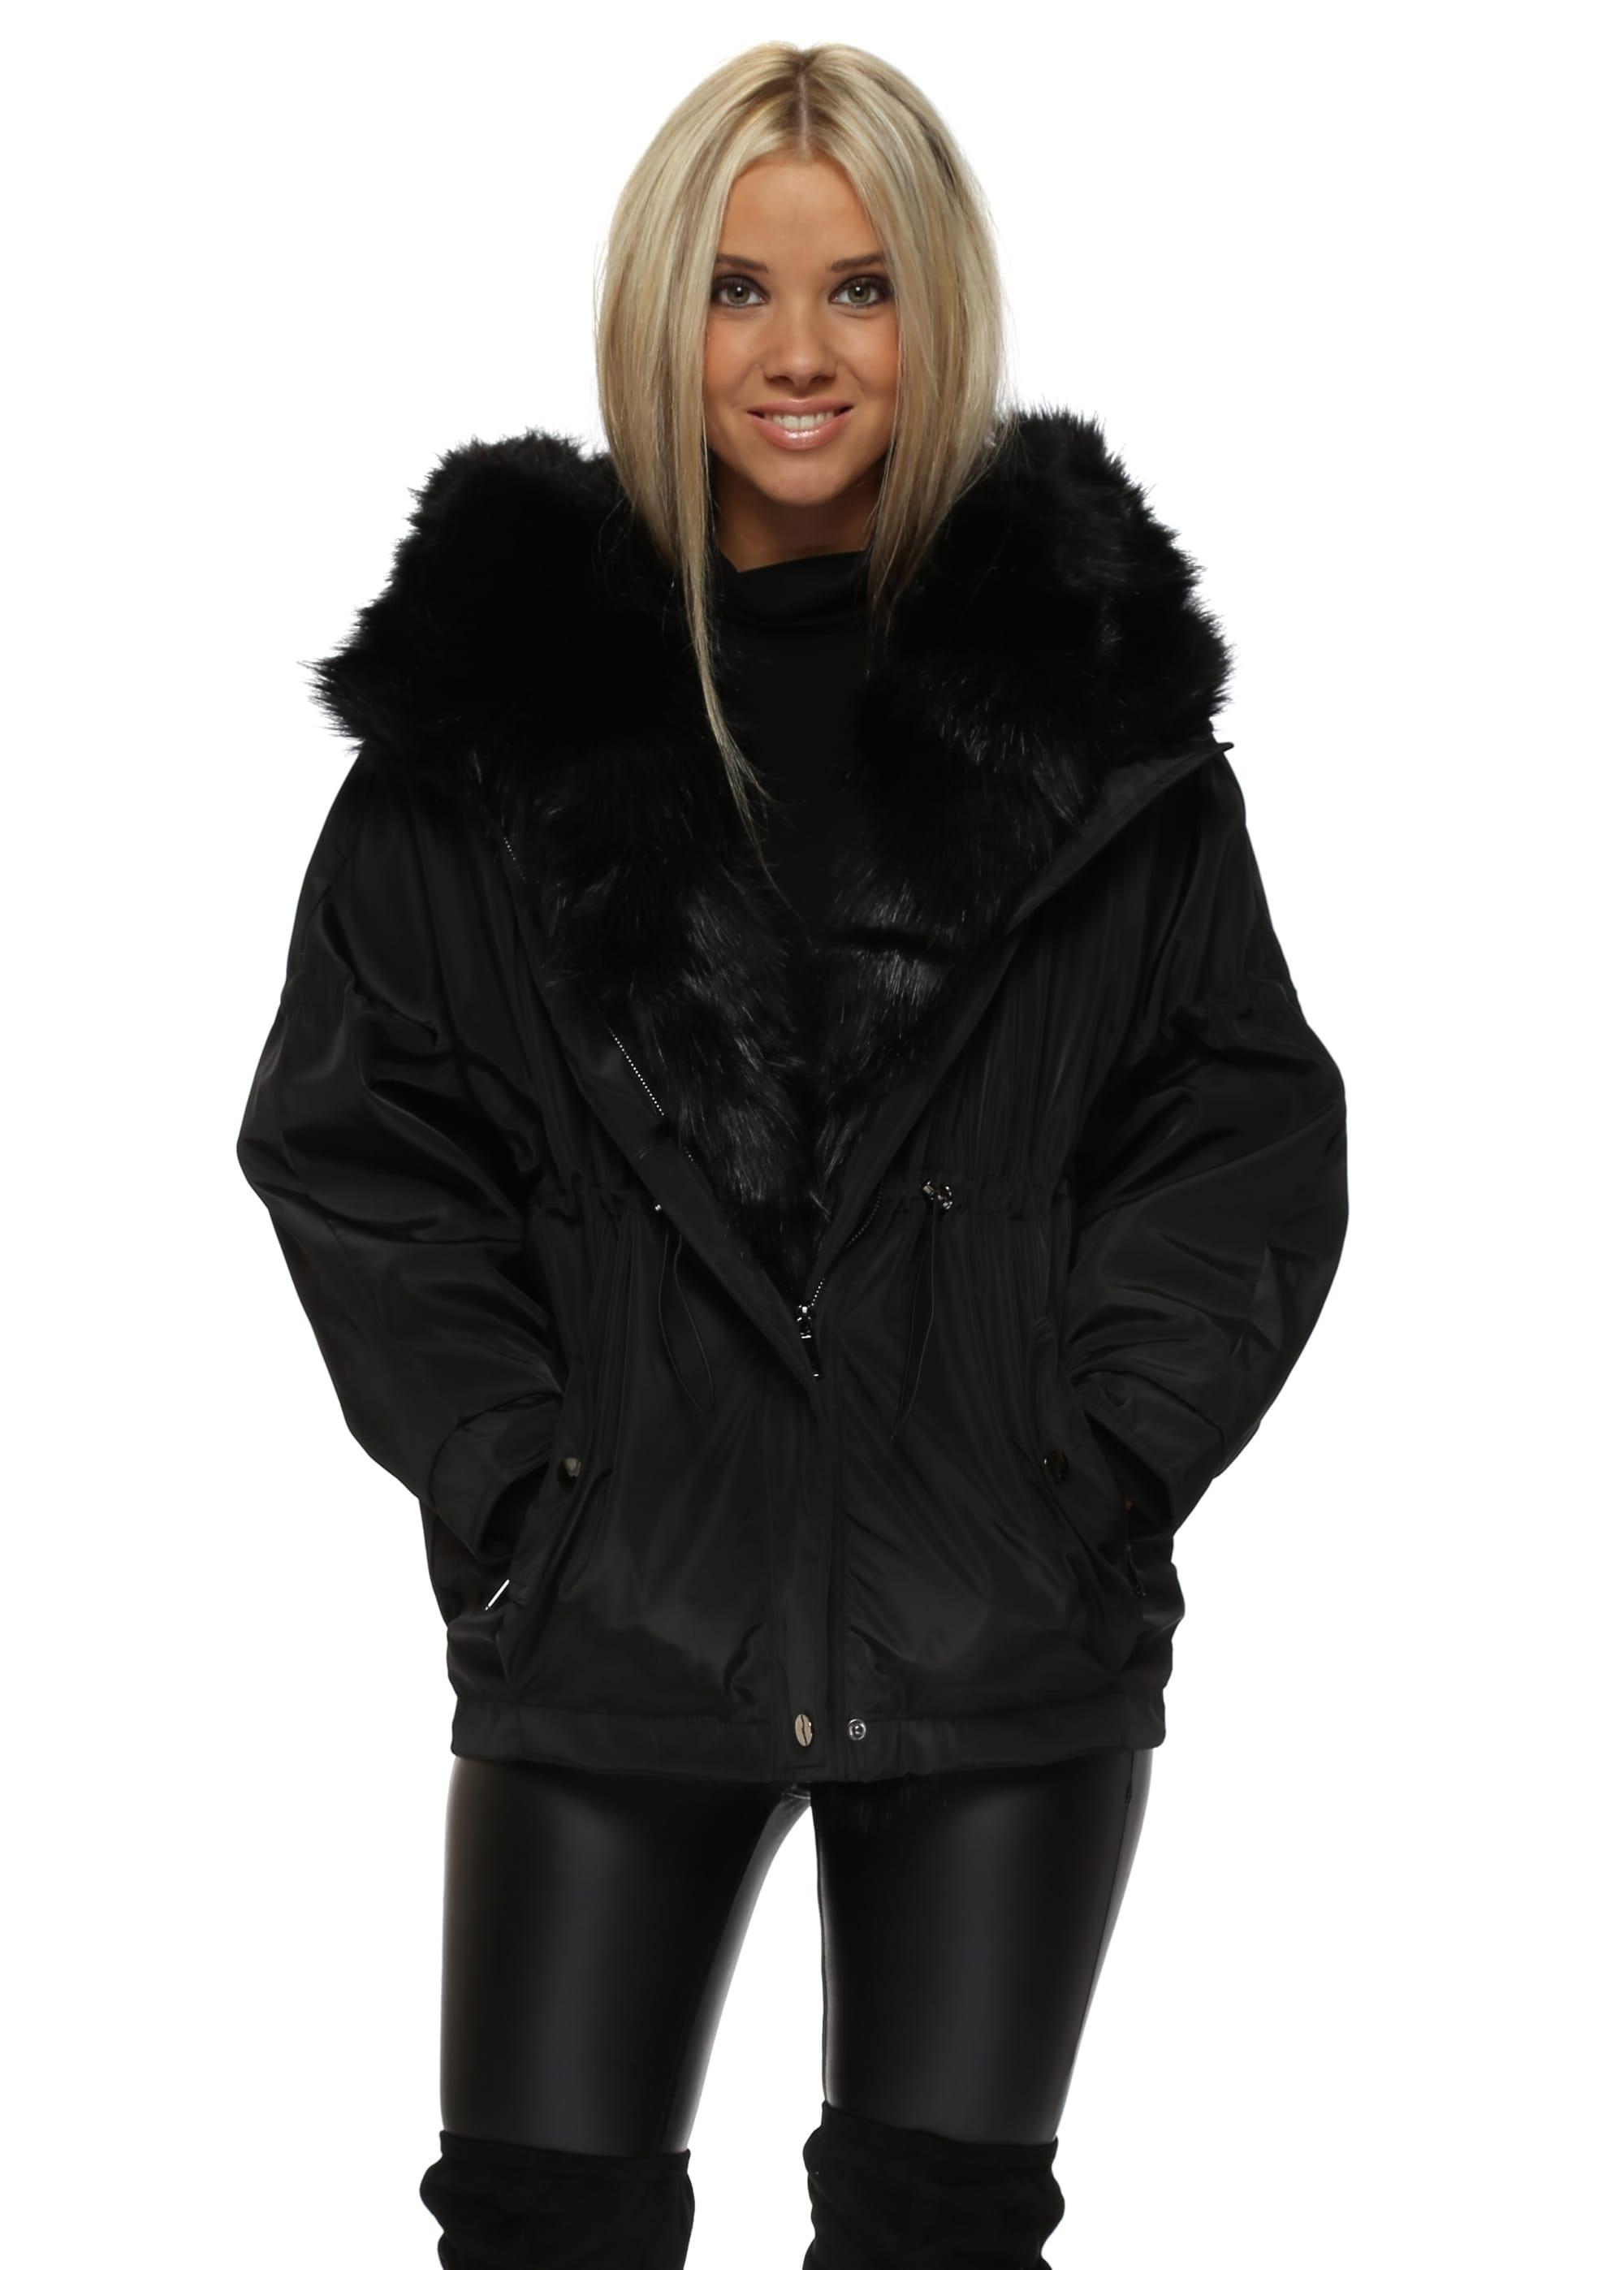 a4add6d41 Drole de Copine Black Hooded Puffer Jacket With Detachable Faux Fur